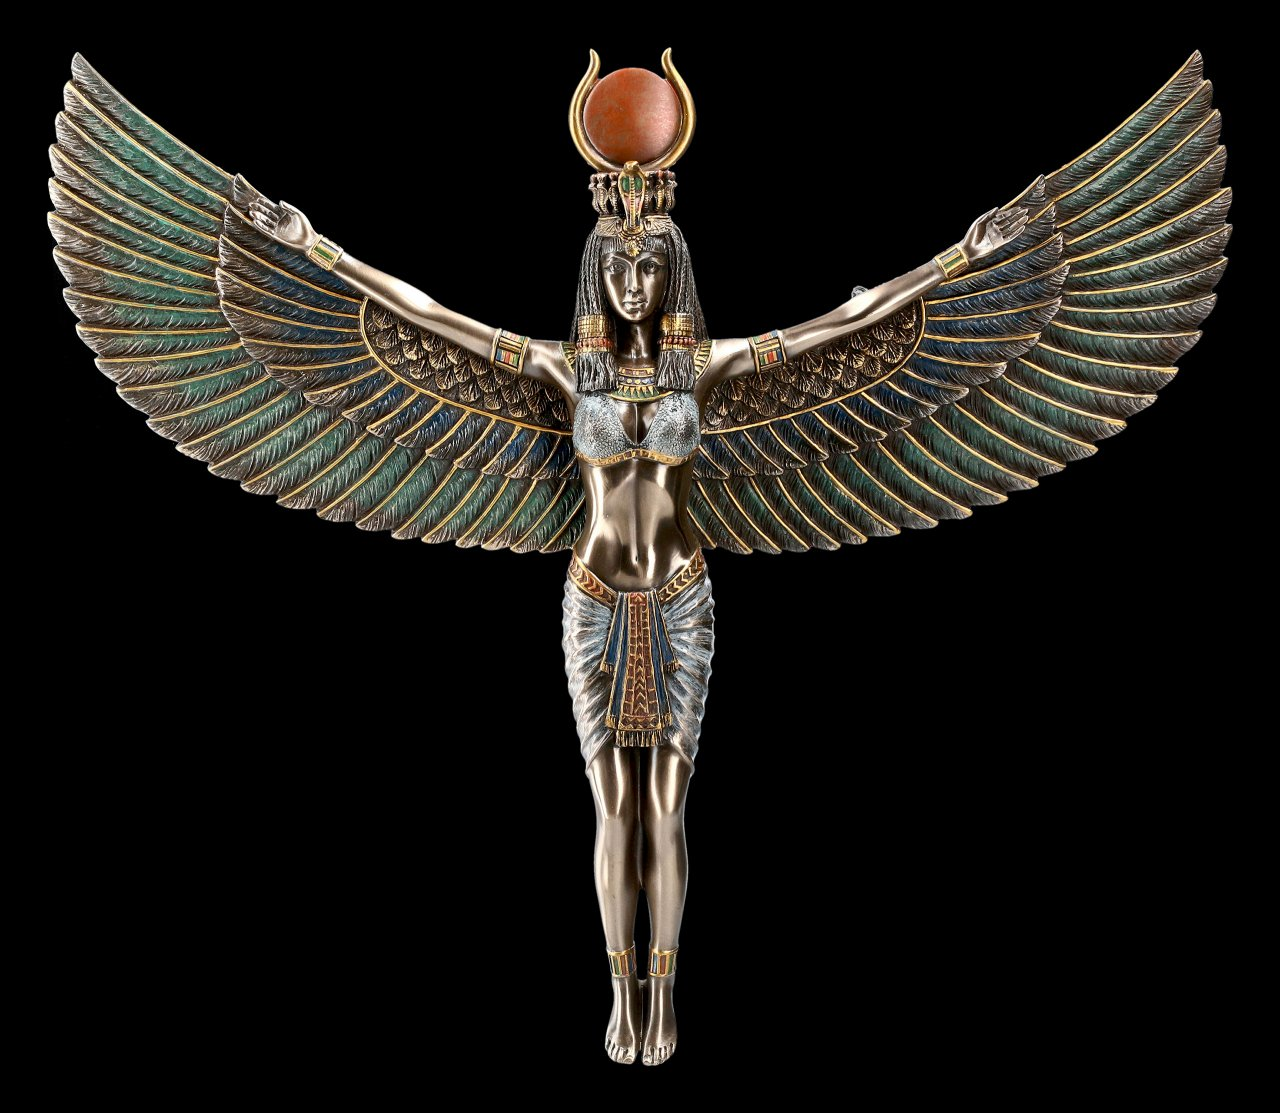 Egypt Wall Ornament - Isis Figurine